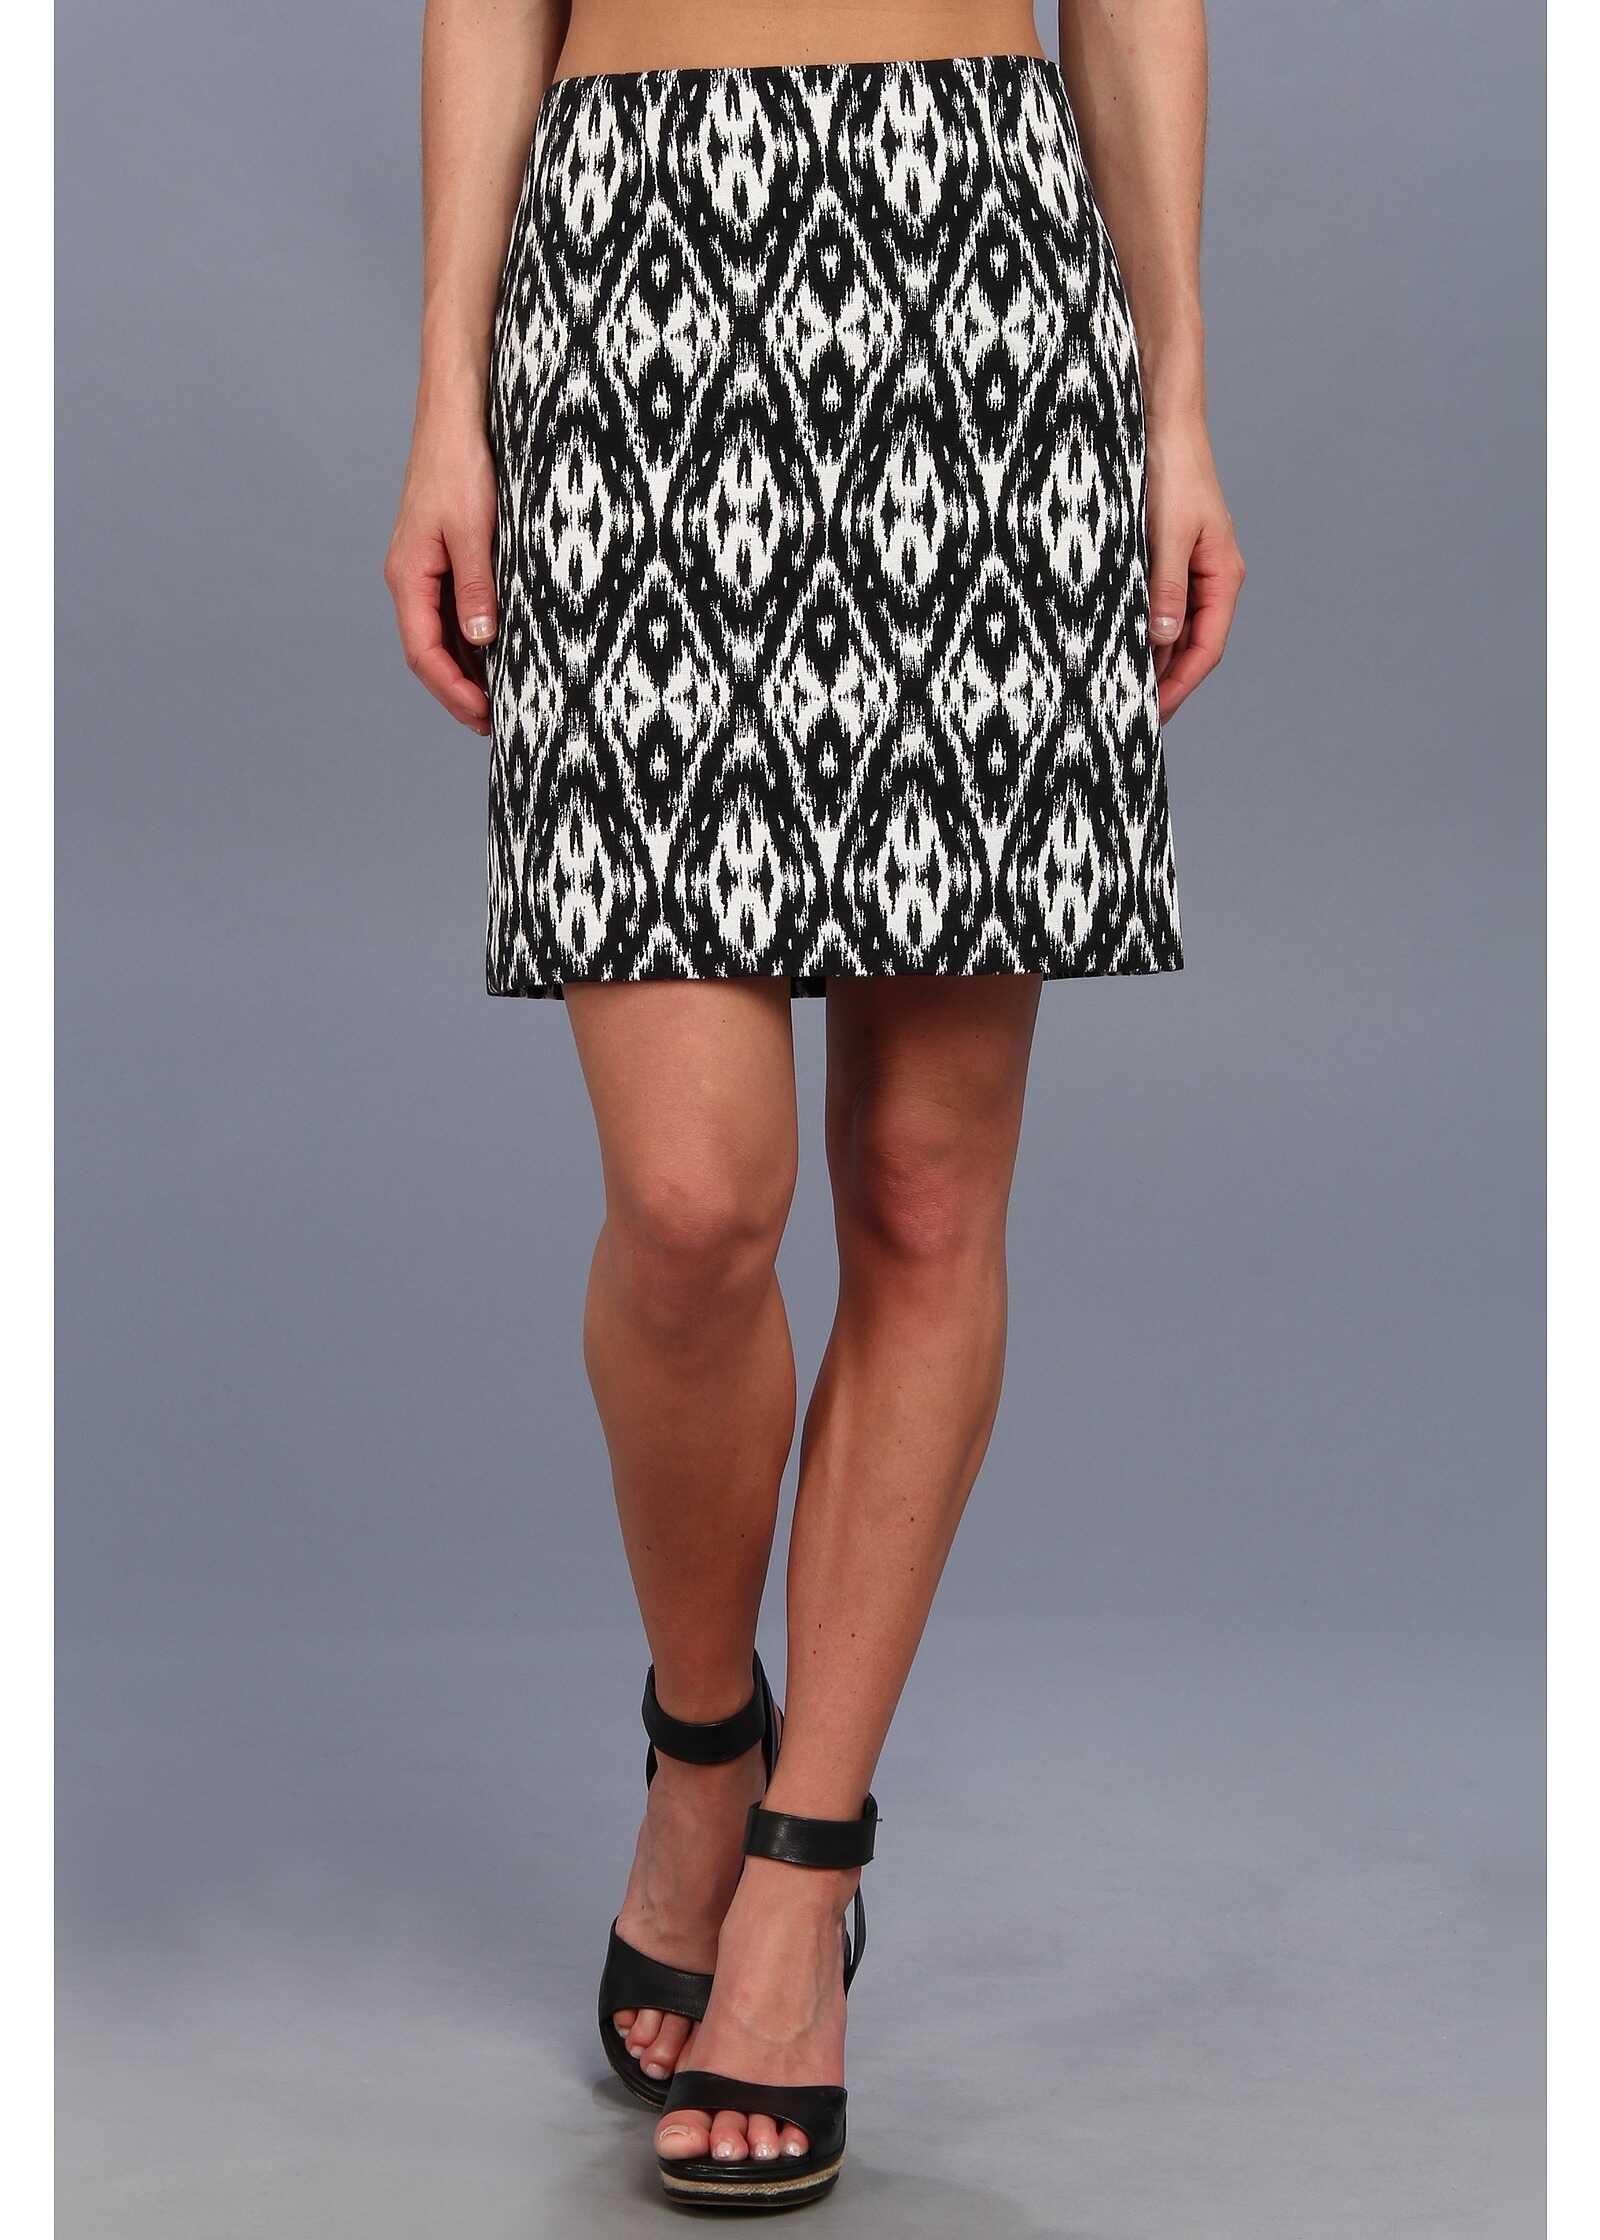 Vince Camuto Navajo Jacquard Skirt* Black